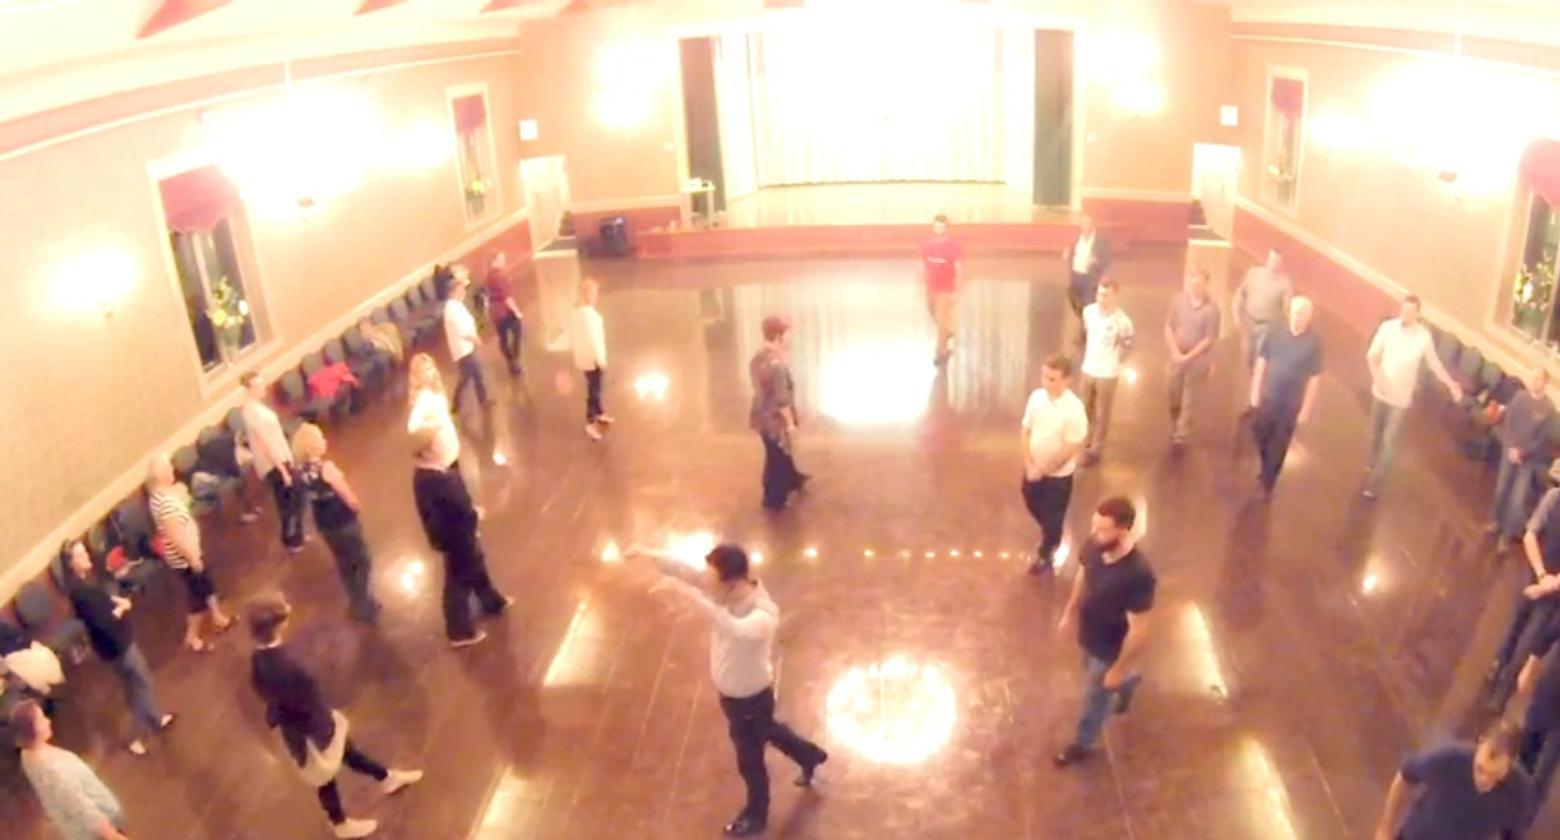 20151001 – Absolute Beginners Ballroom Session 02 (Foxtrot)